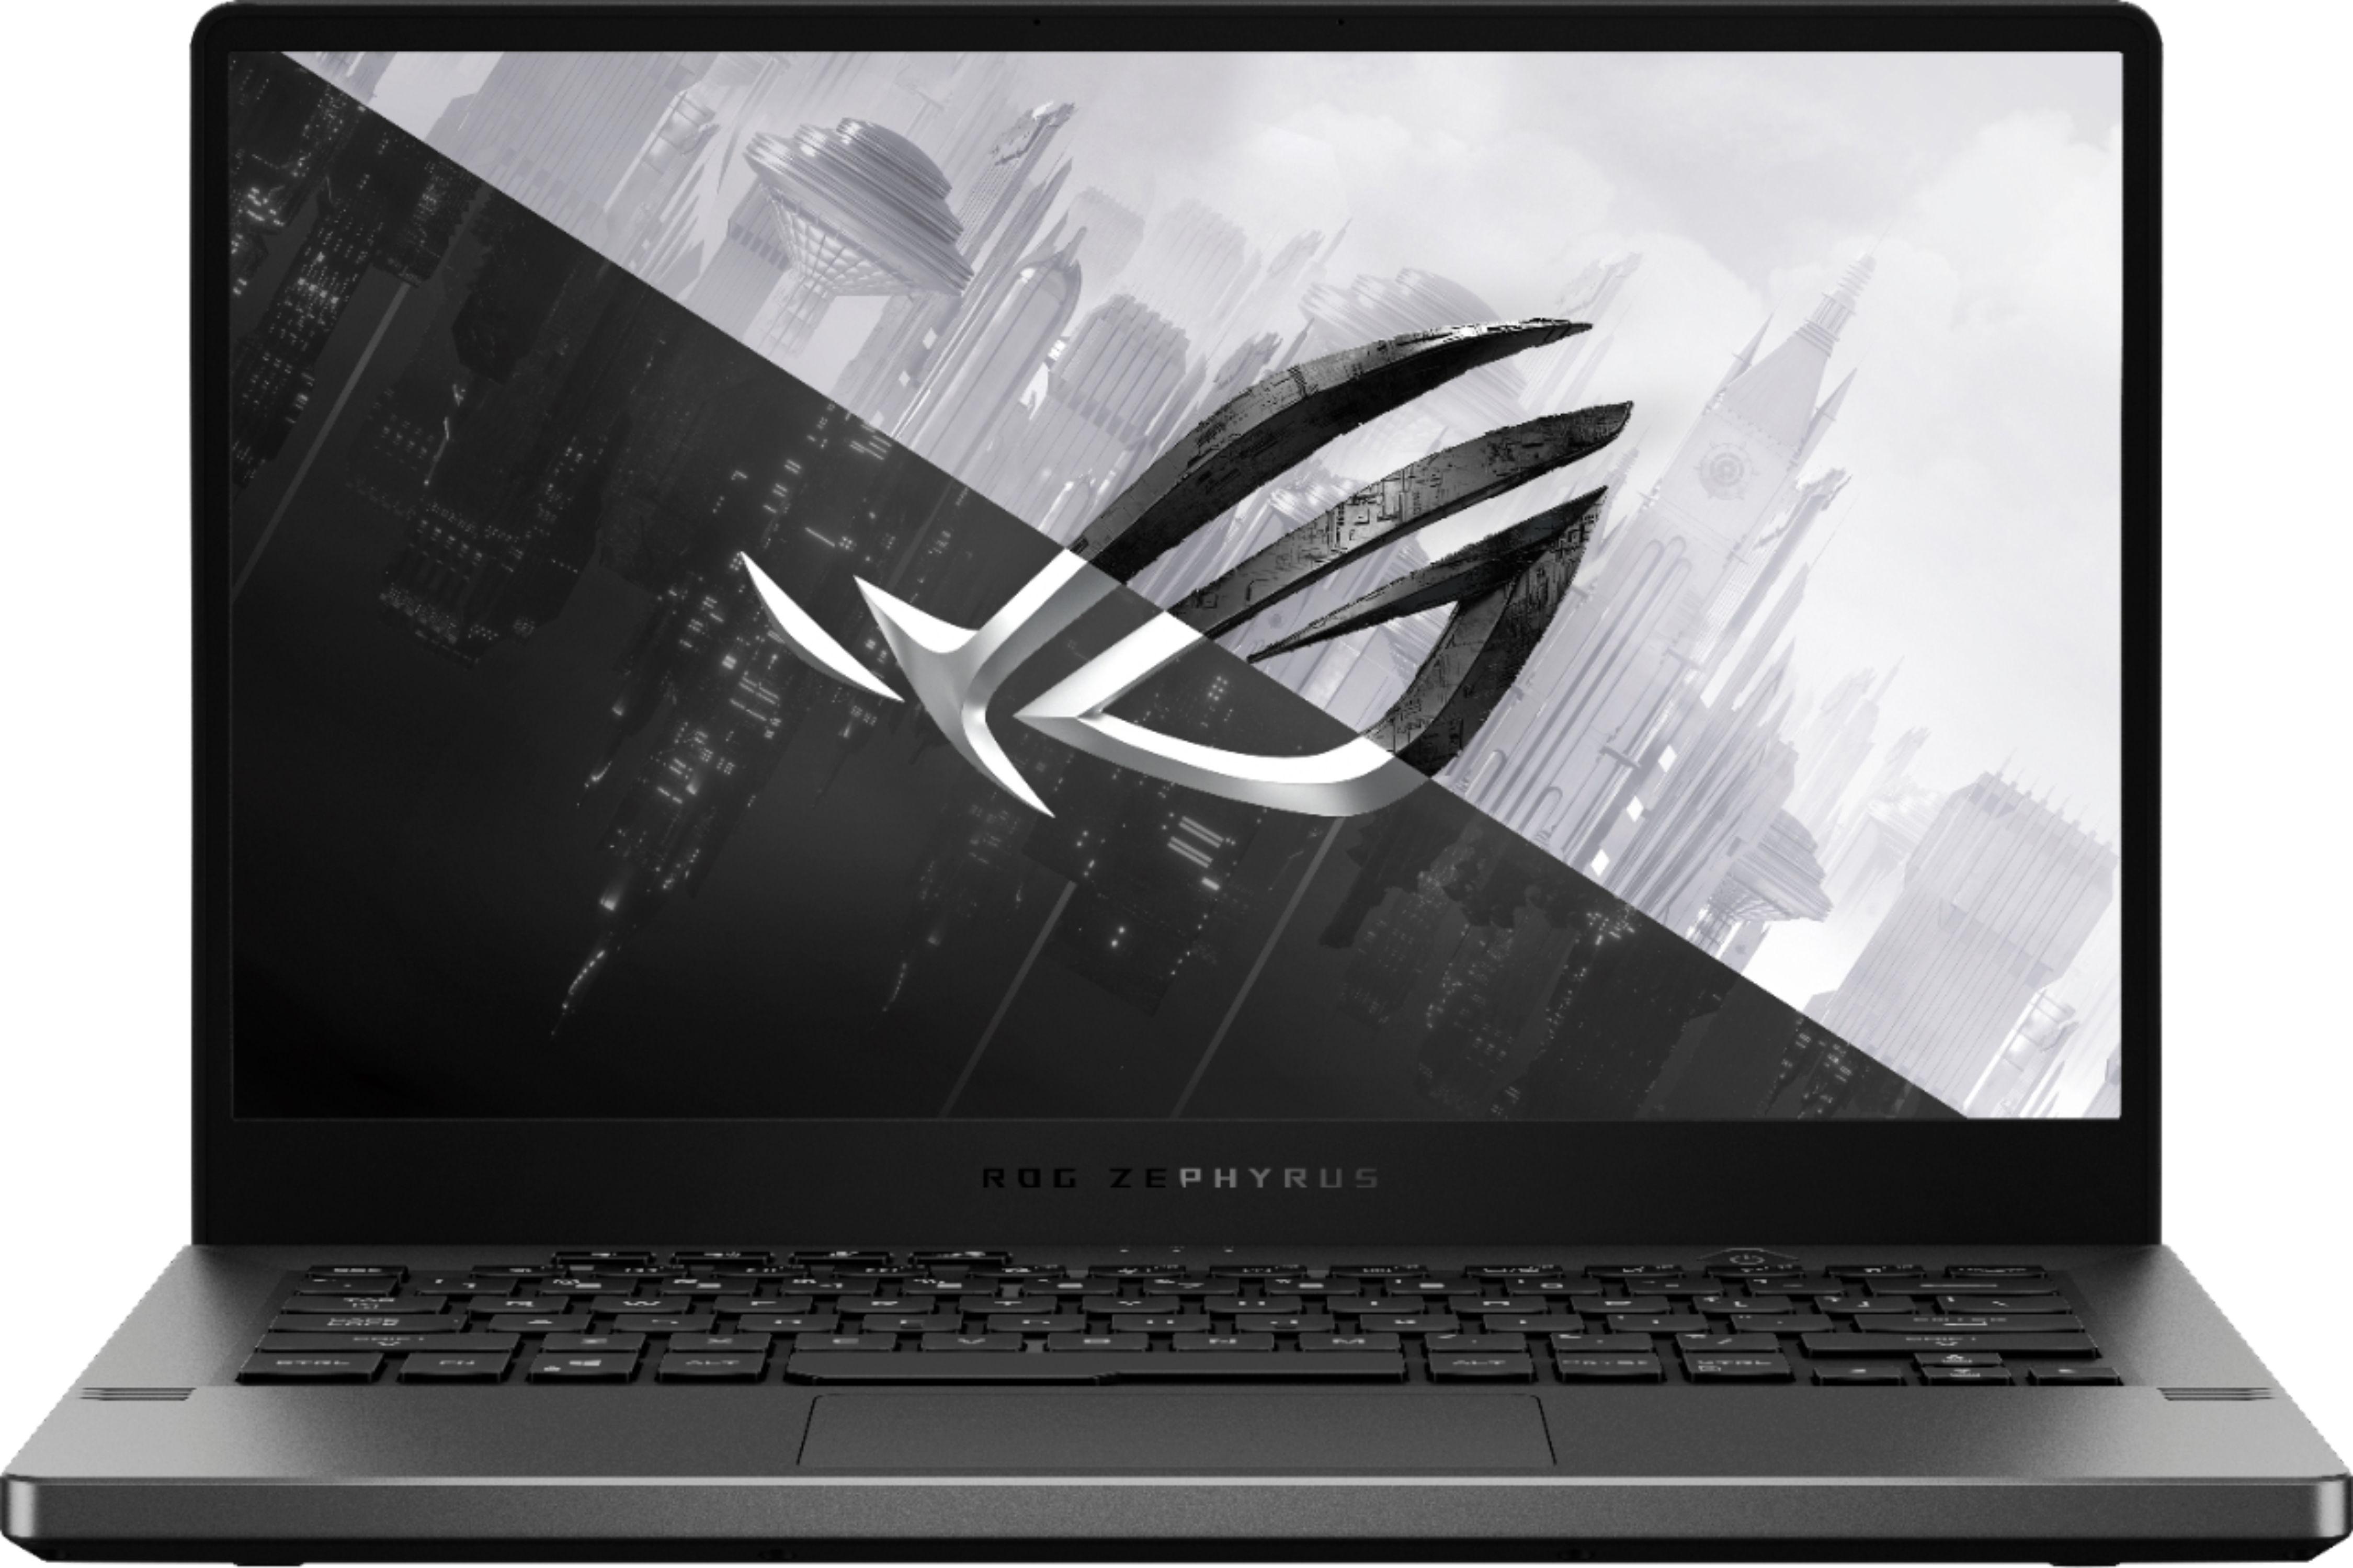 "ASUS ROG Zephyrus G14 14"" Laptop AMD Ryzen 7 8GB Memory NVIDIA GeForce GTX 1650 512GB SSD Eclipse Gray GA401IH-BR7N2BL - Best Buy $899.99"